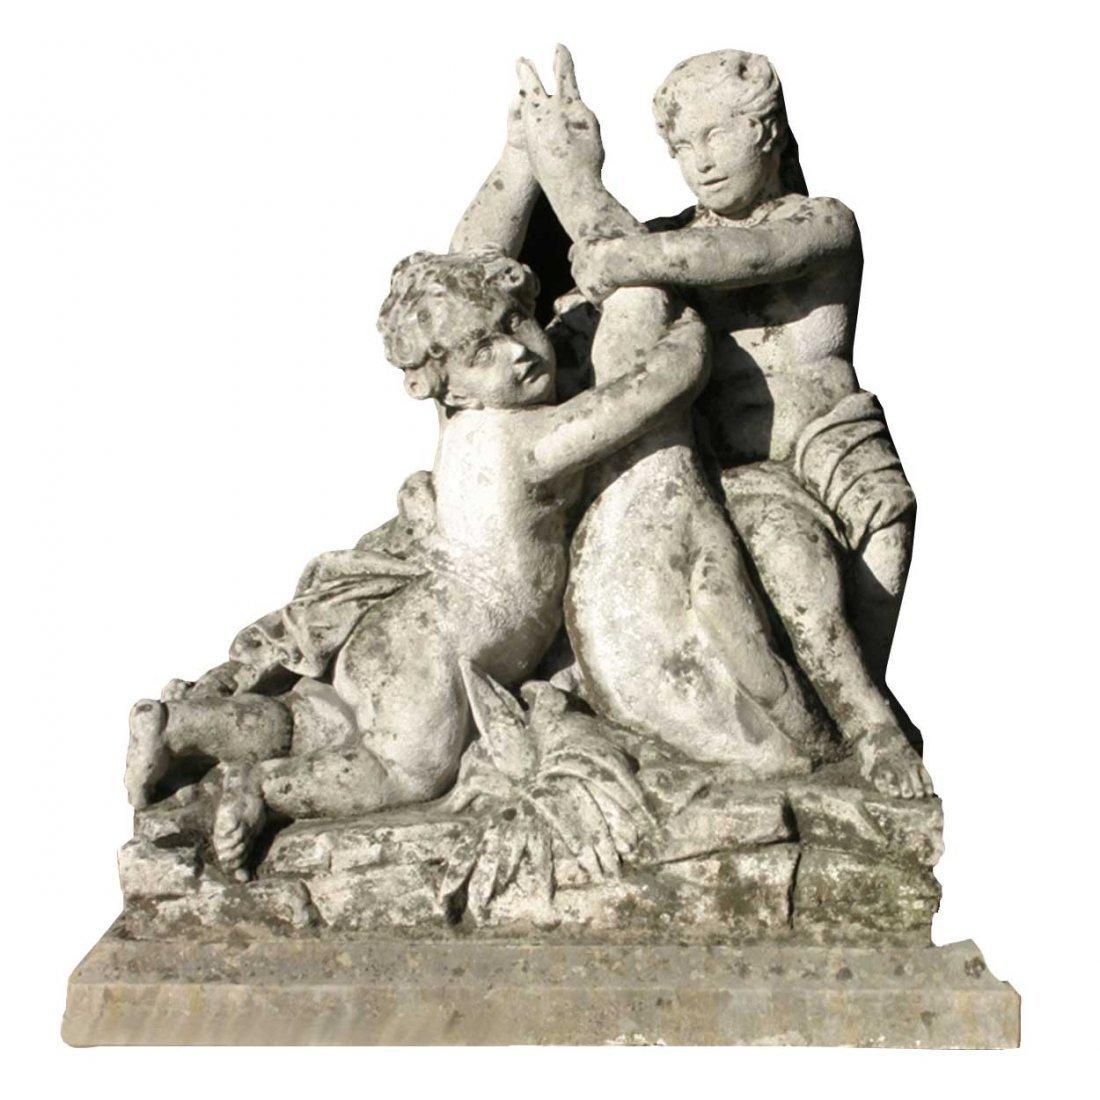 922: A French Louis XVI Neoclassical Limestone Garden S